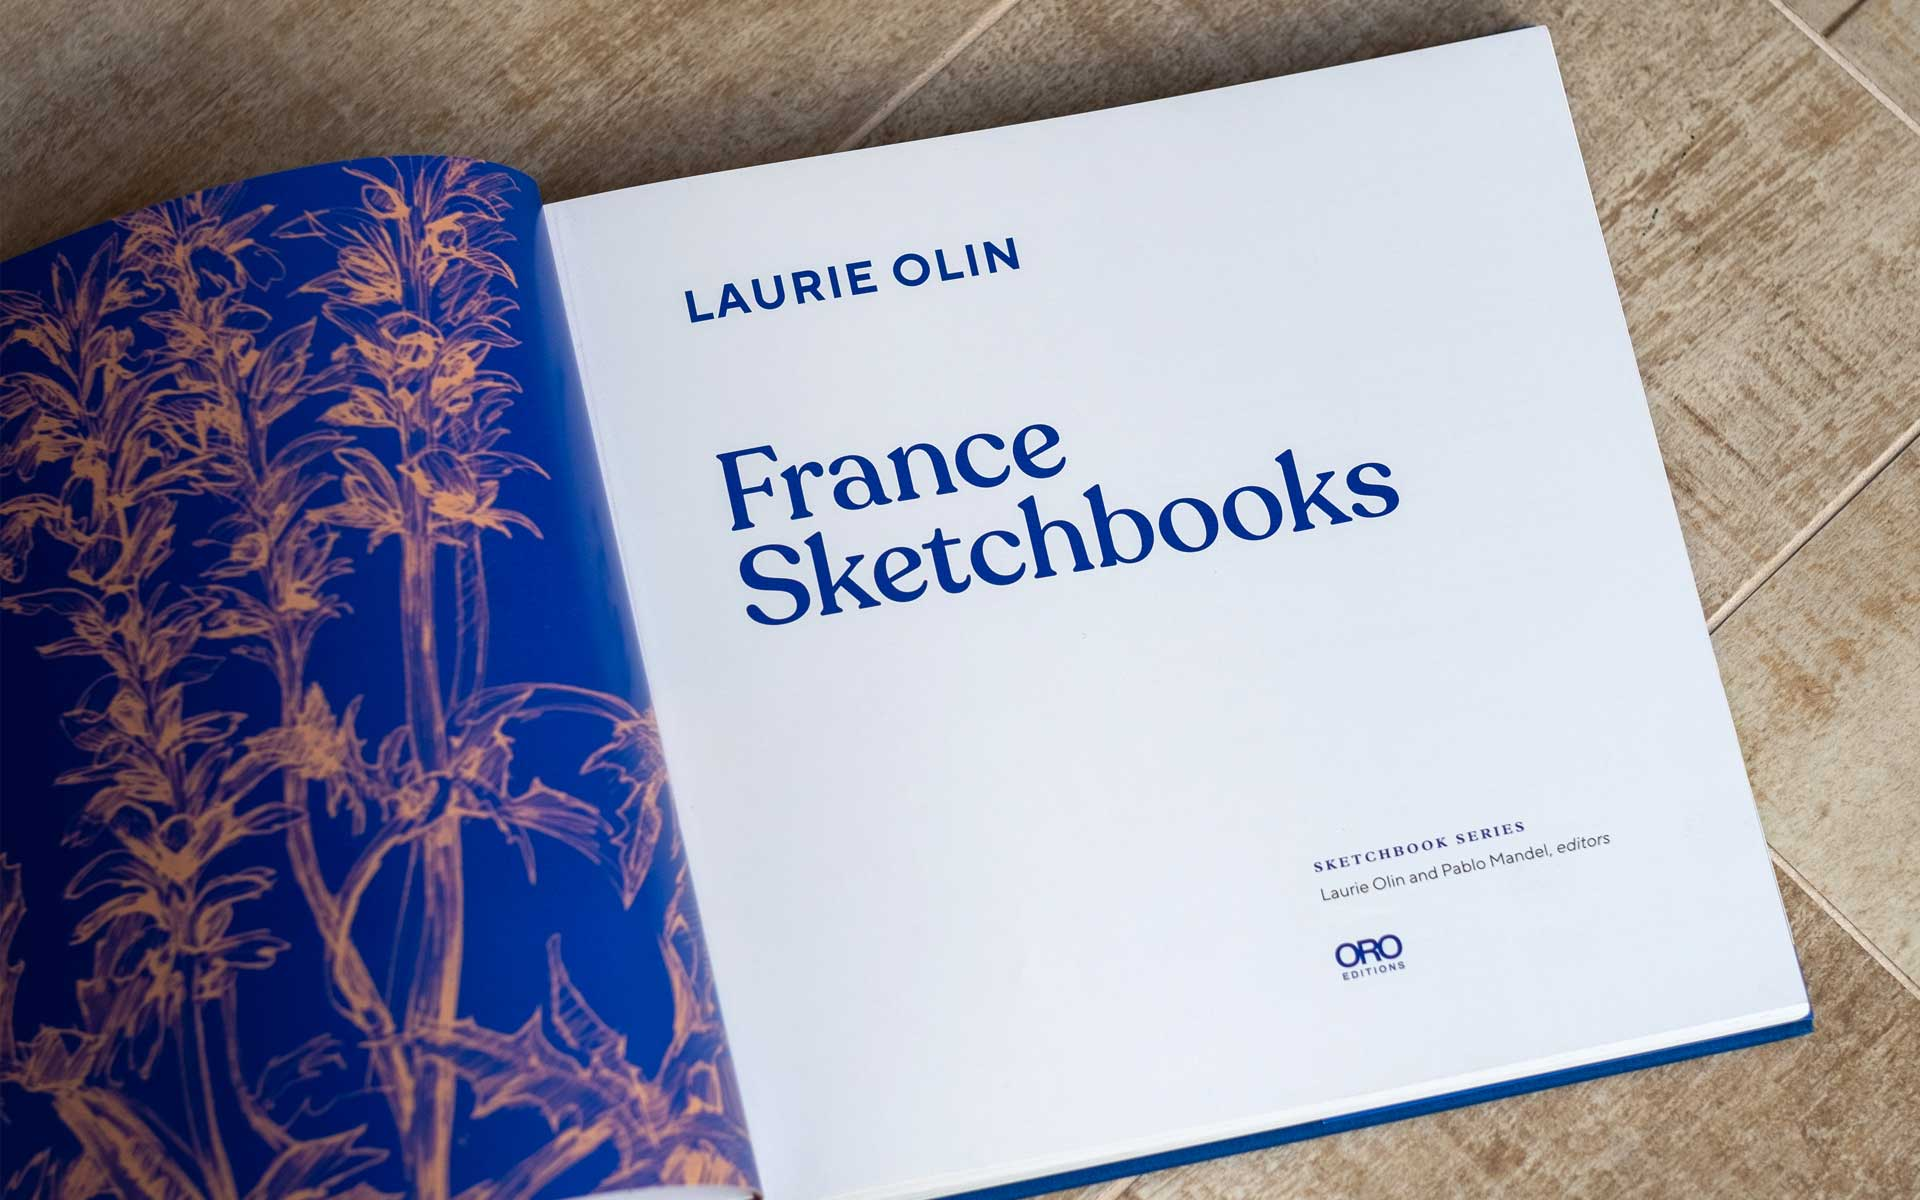 sketchbooks-laurie-olin-3